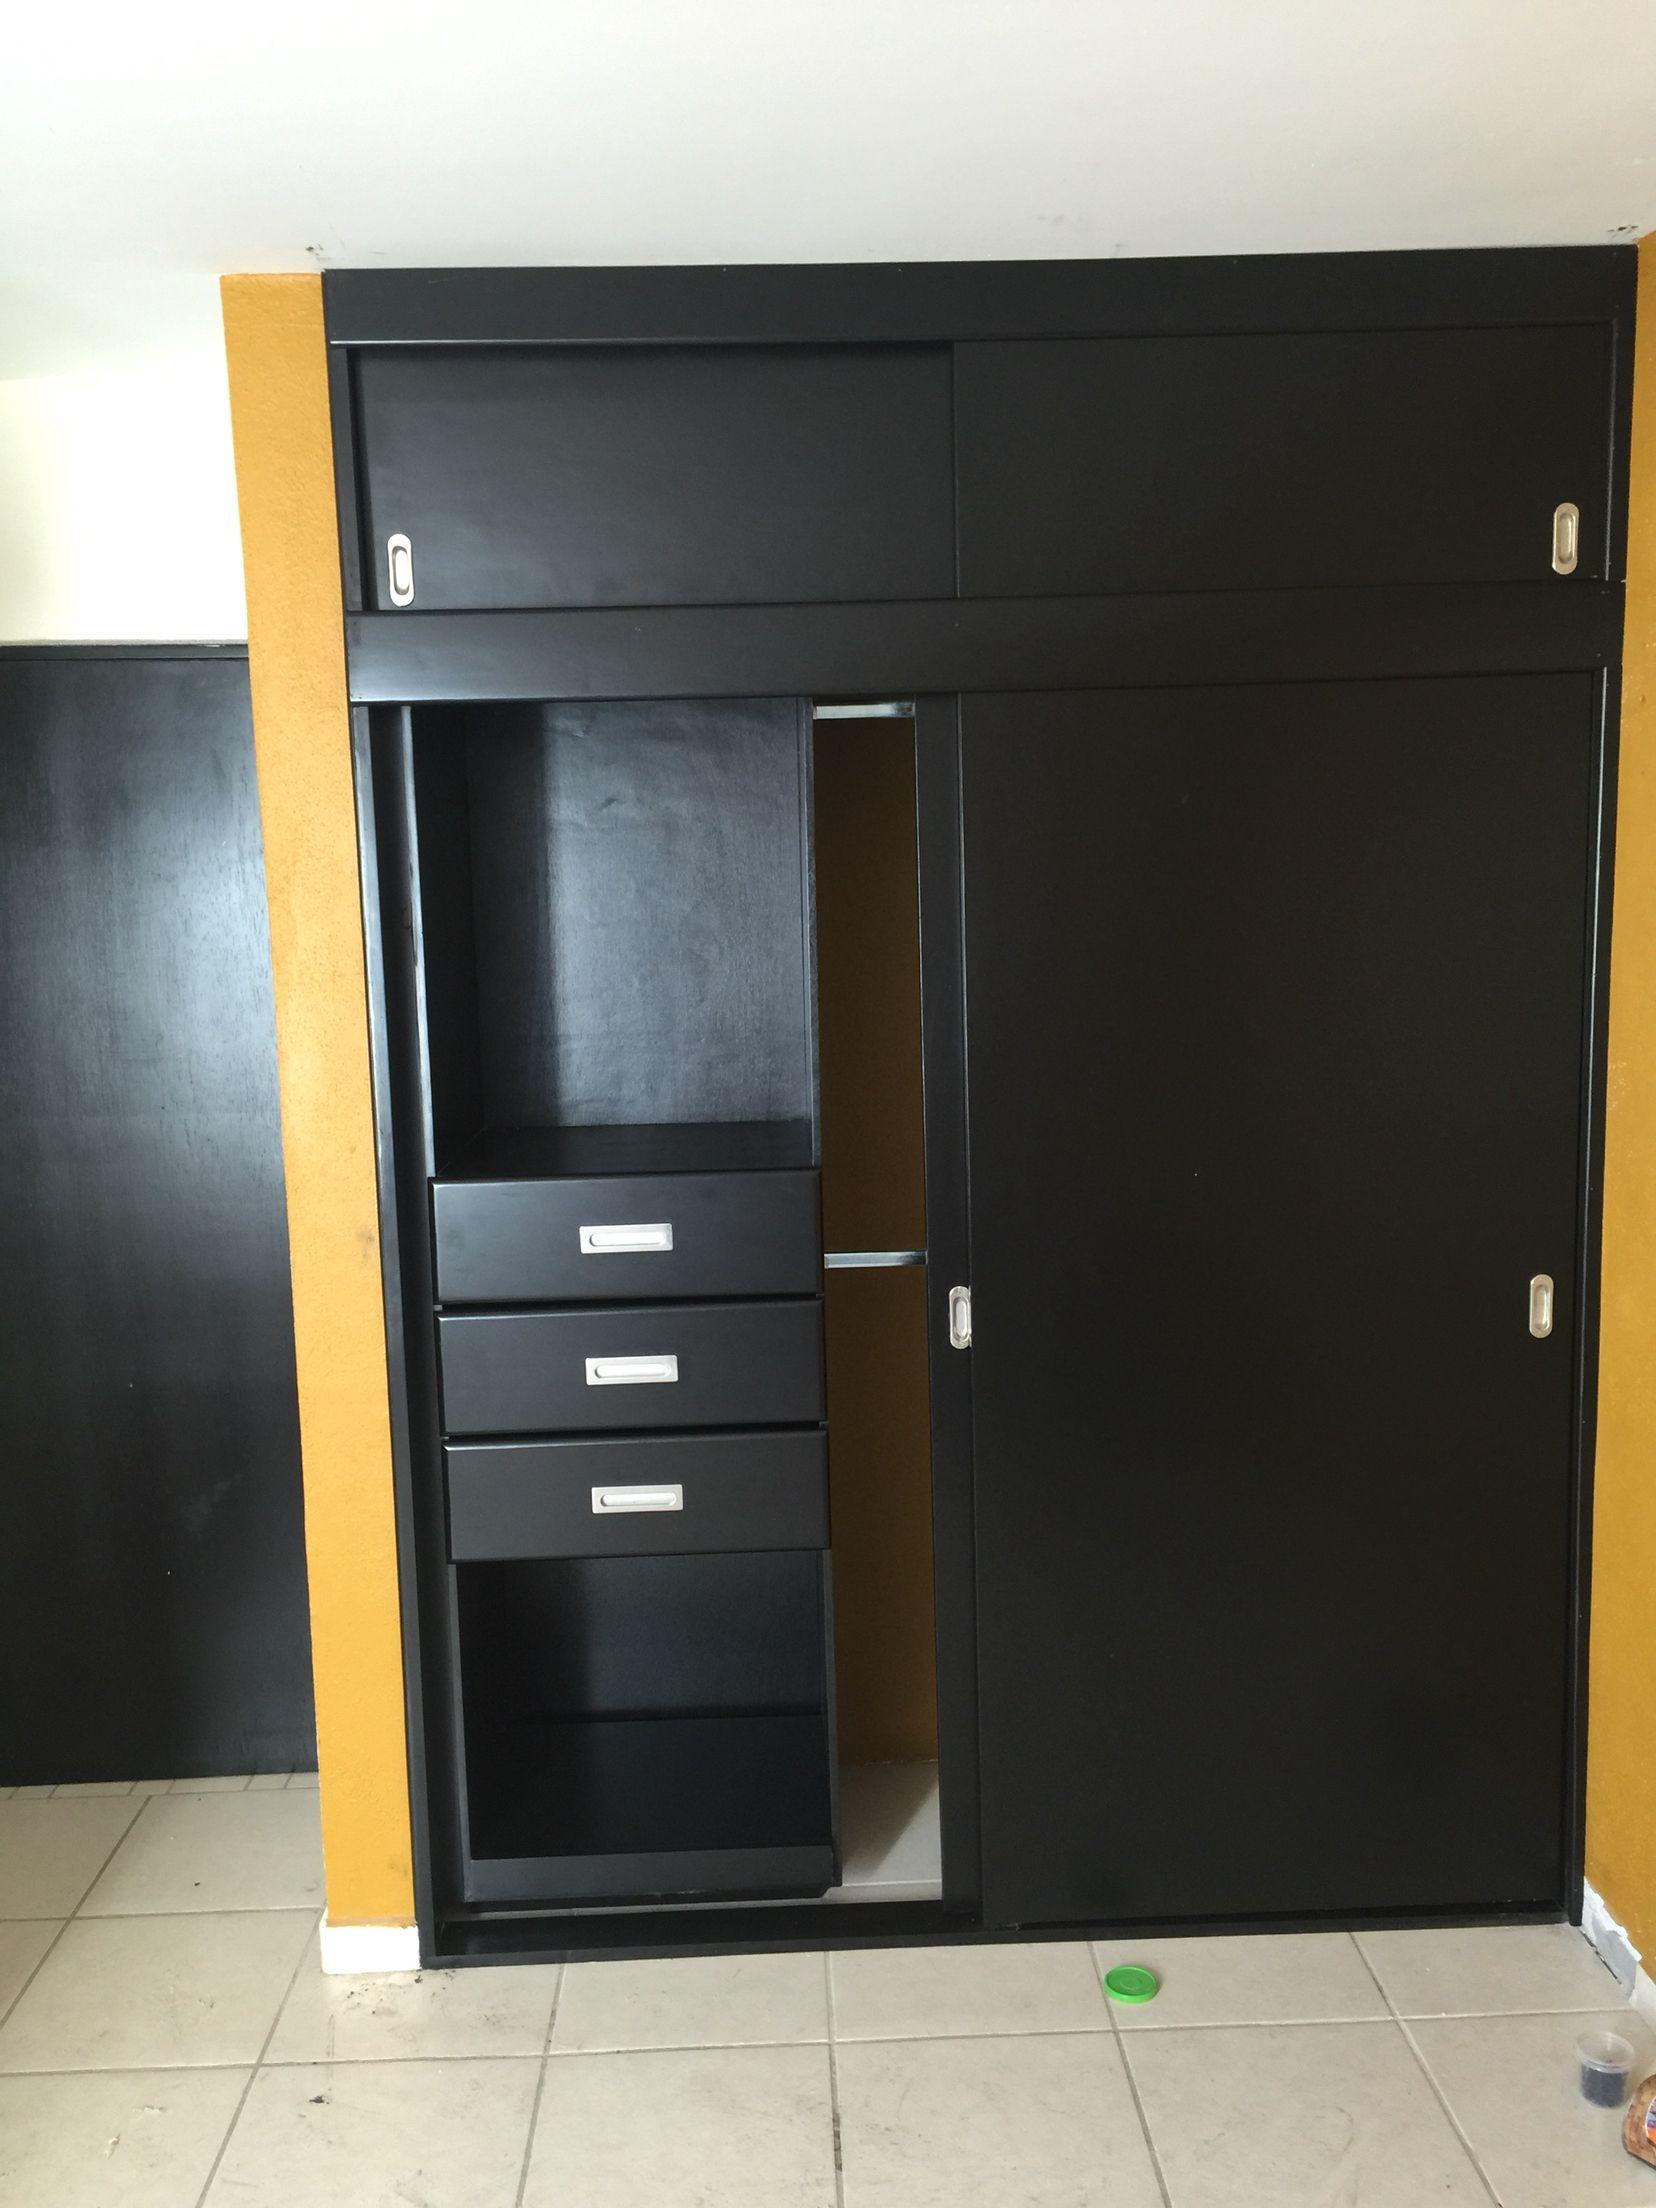 Closet Con Puertas Corredizas Color Chocolate Diseno De Armario Para Dormitorio Closet De Madera Modernos Diseno De Armario